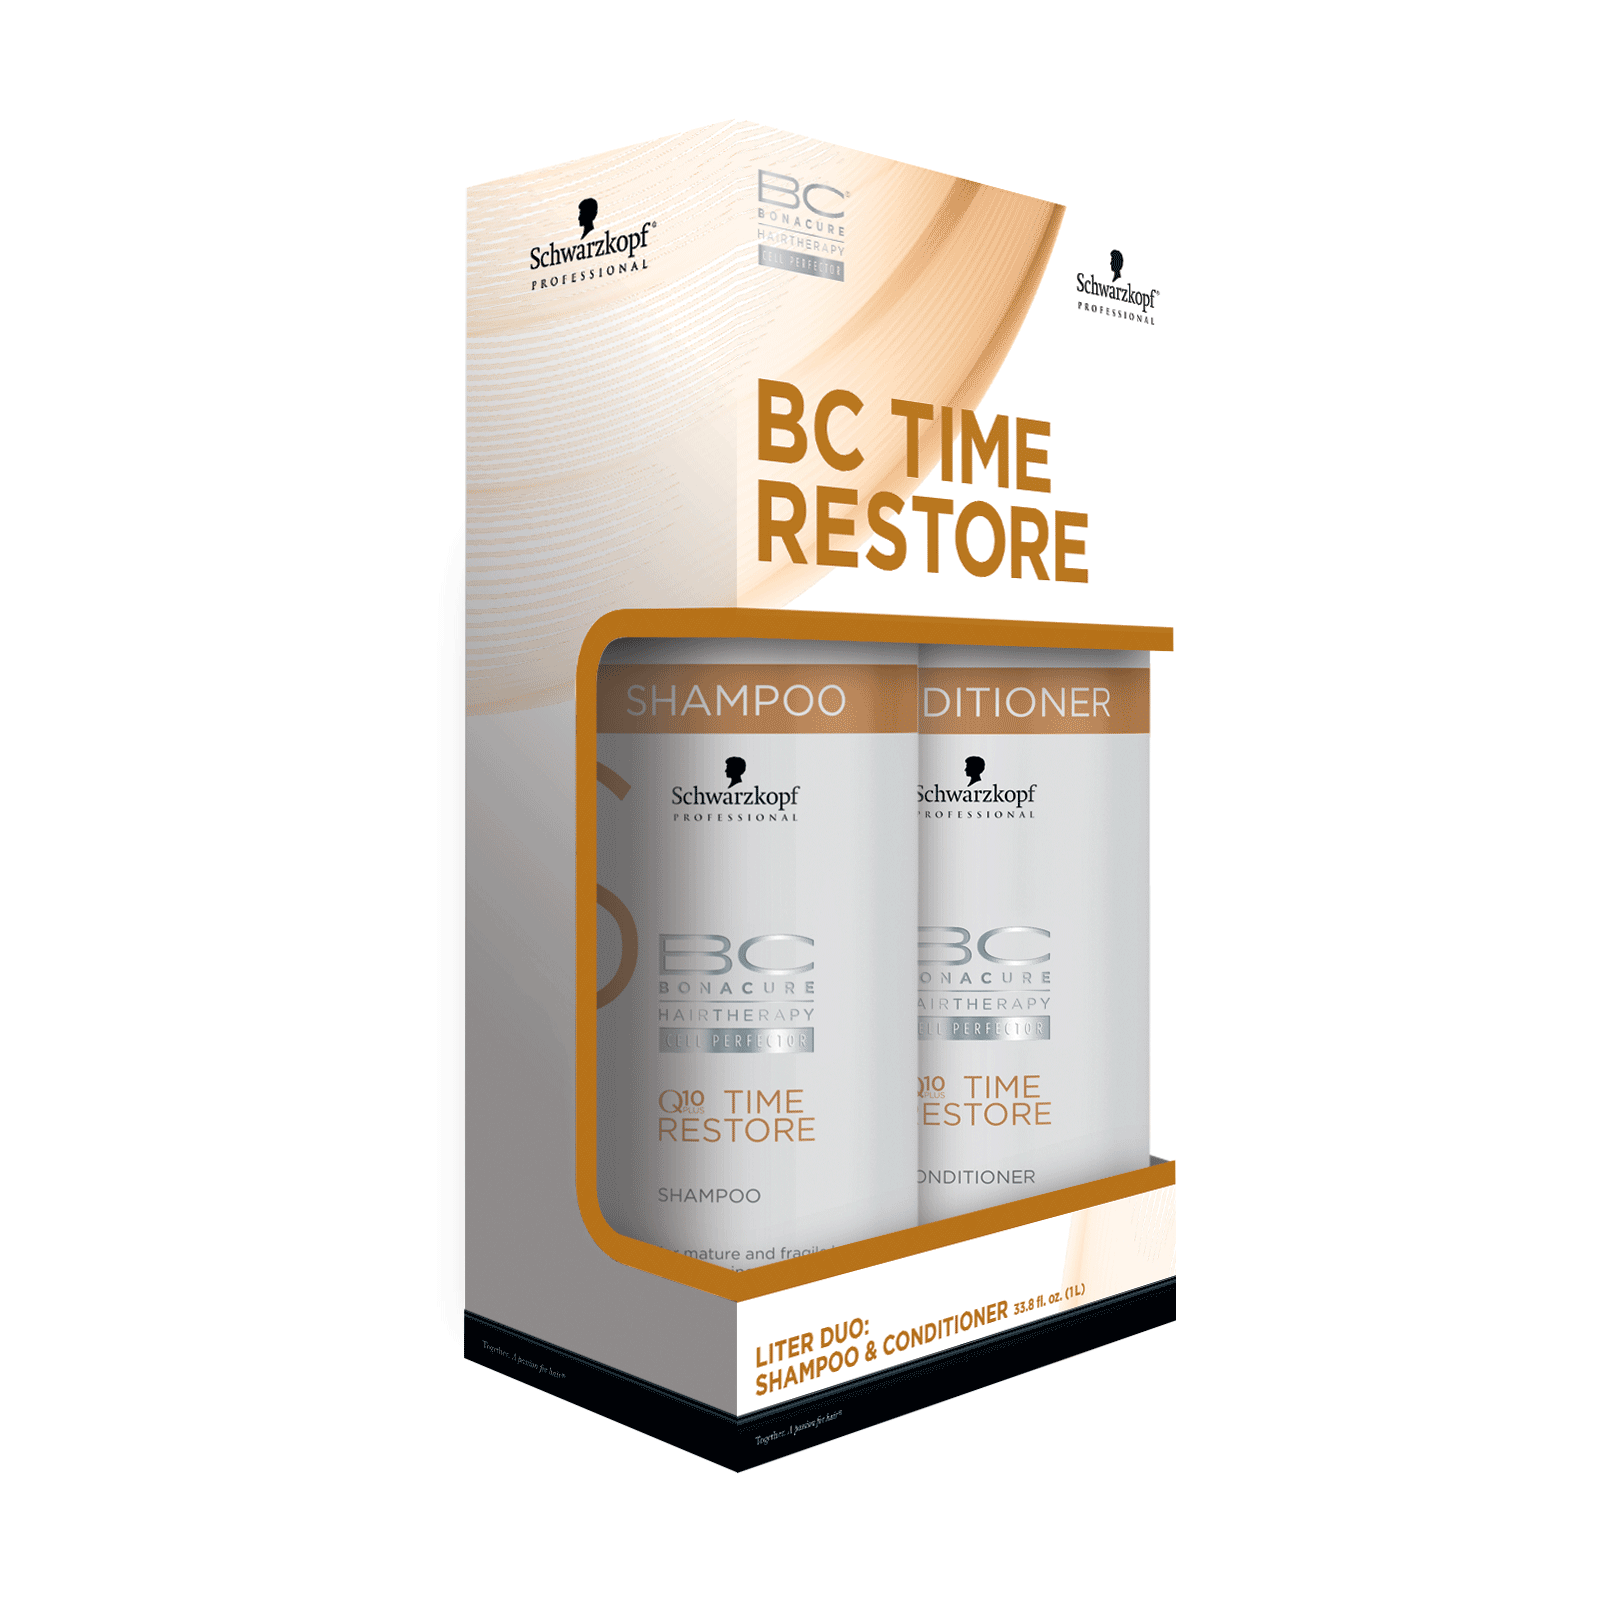 ee5bafc95d Bonacure Q10 Time Restore Shampoo,Conditioner,Pump Liter Duo ...